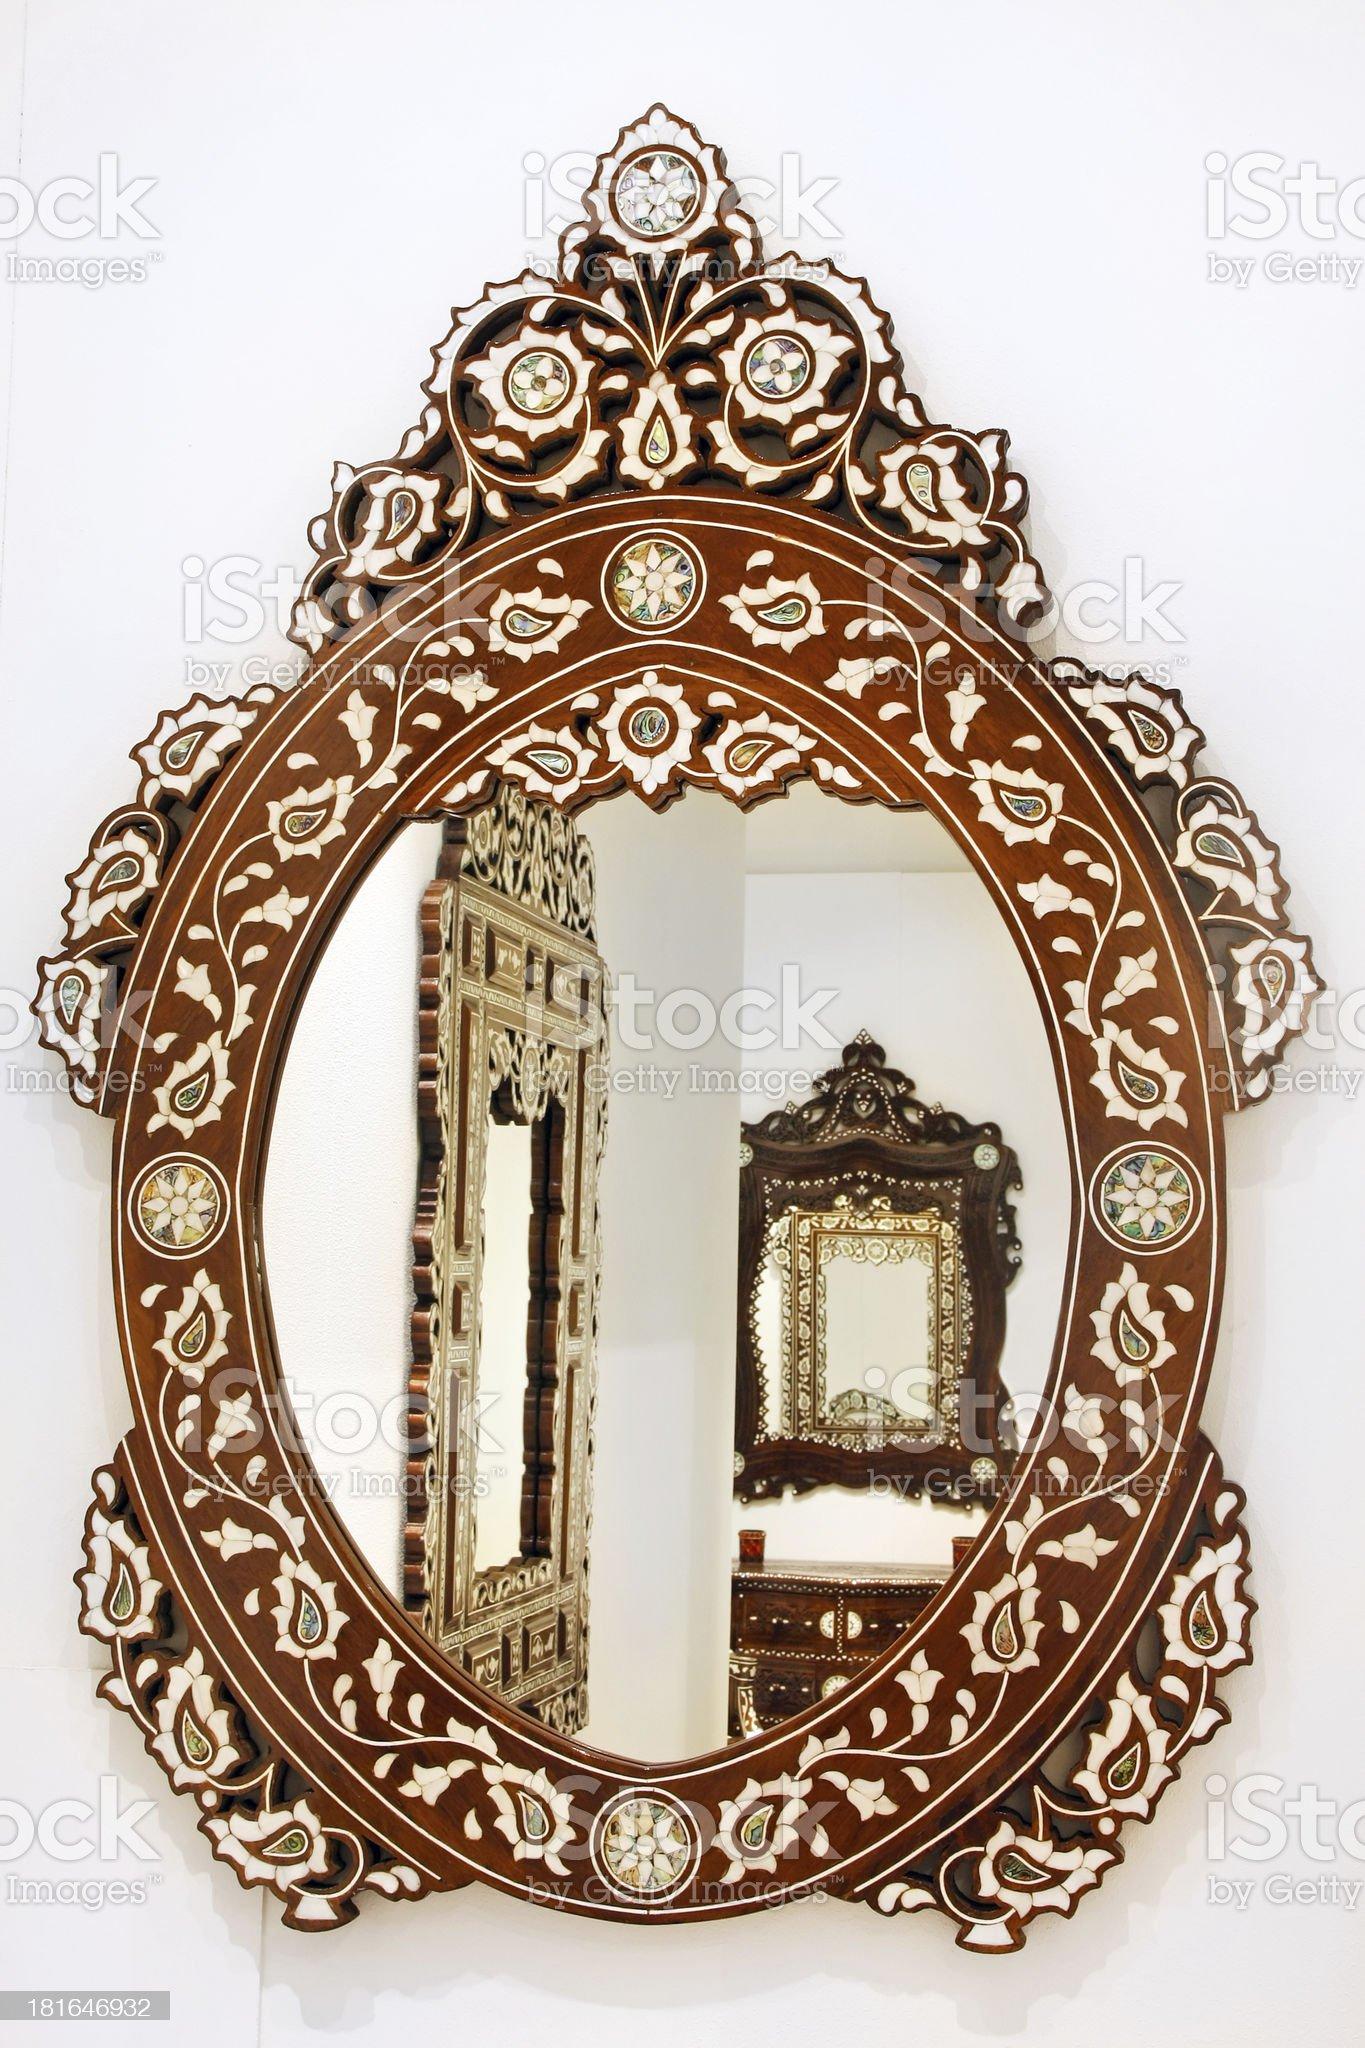 Oval mirror royalty-free stock photo